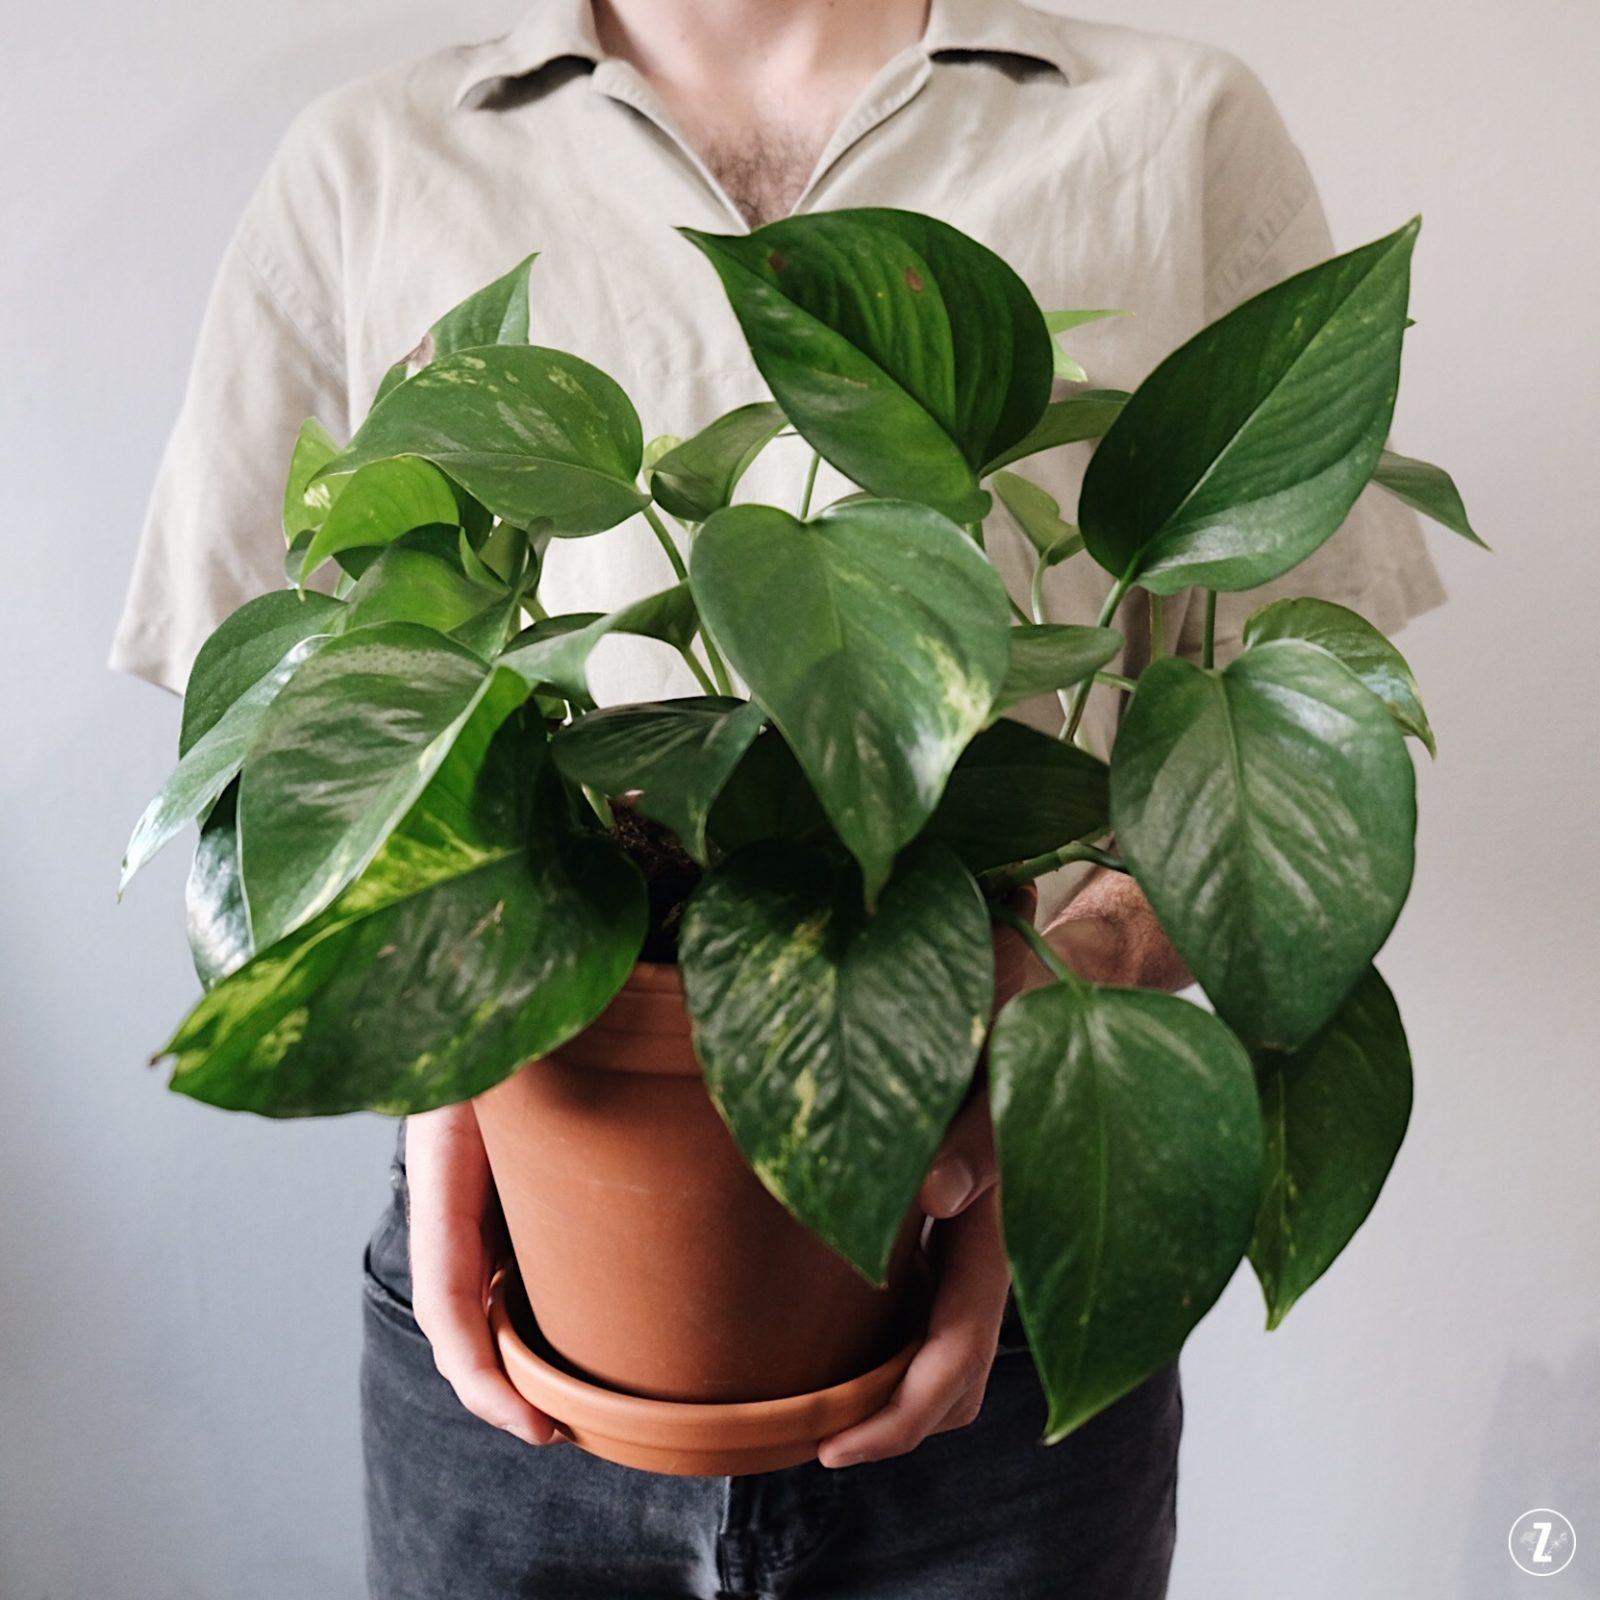 adopcja roslin, epipremnum zlociste, Epipremnum aureum, PictureThis, pierwsza roślina, projekt rosliny, roslinne porady